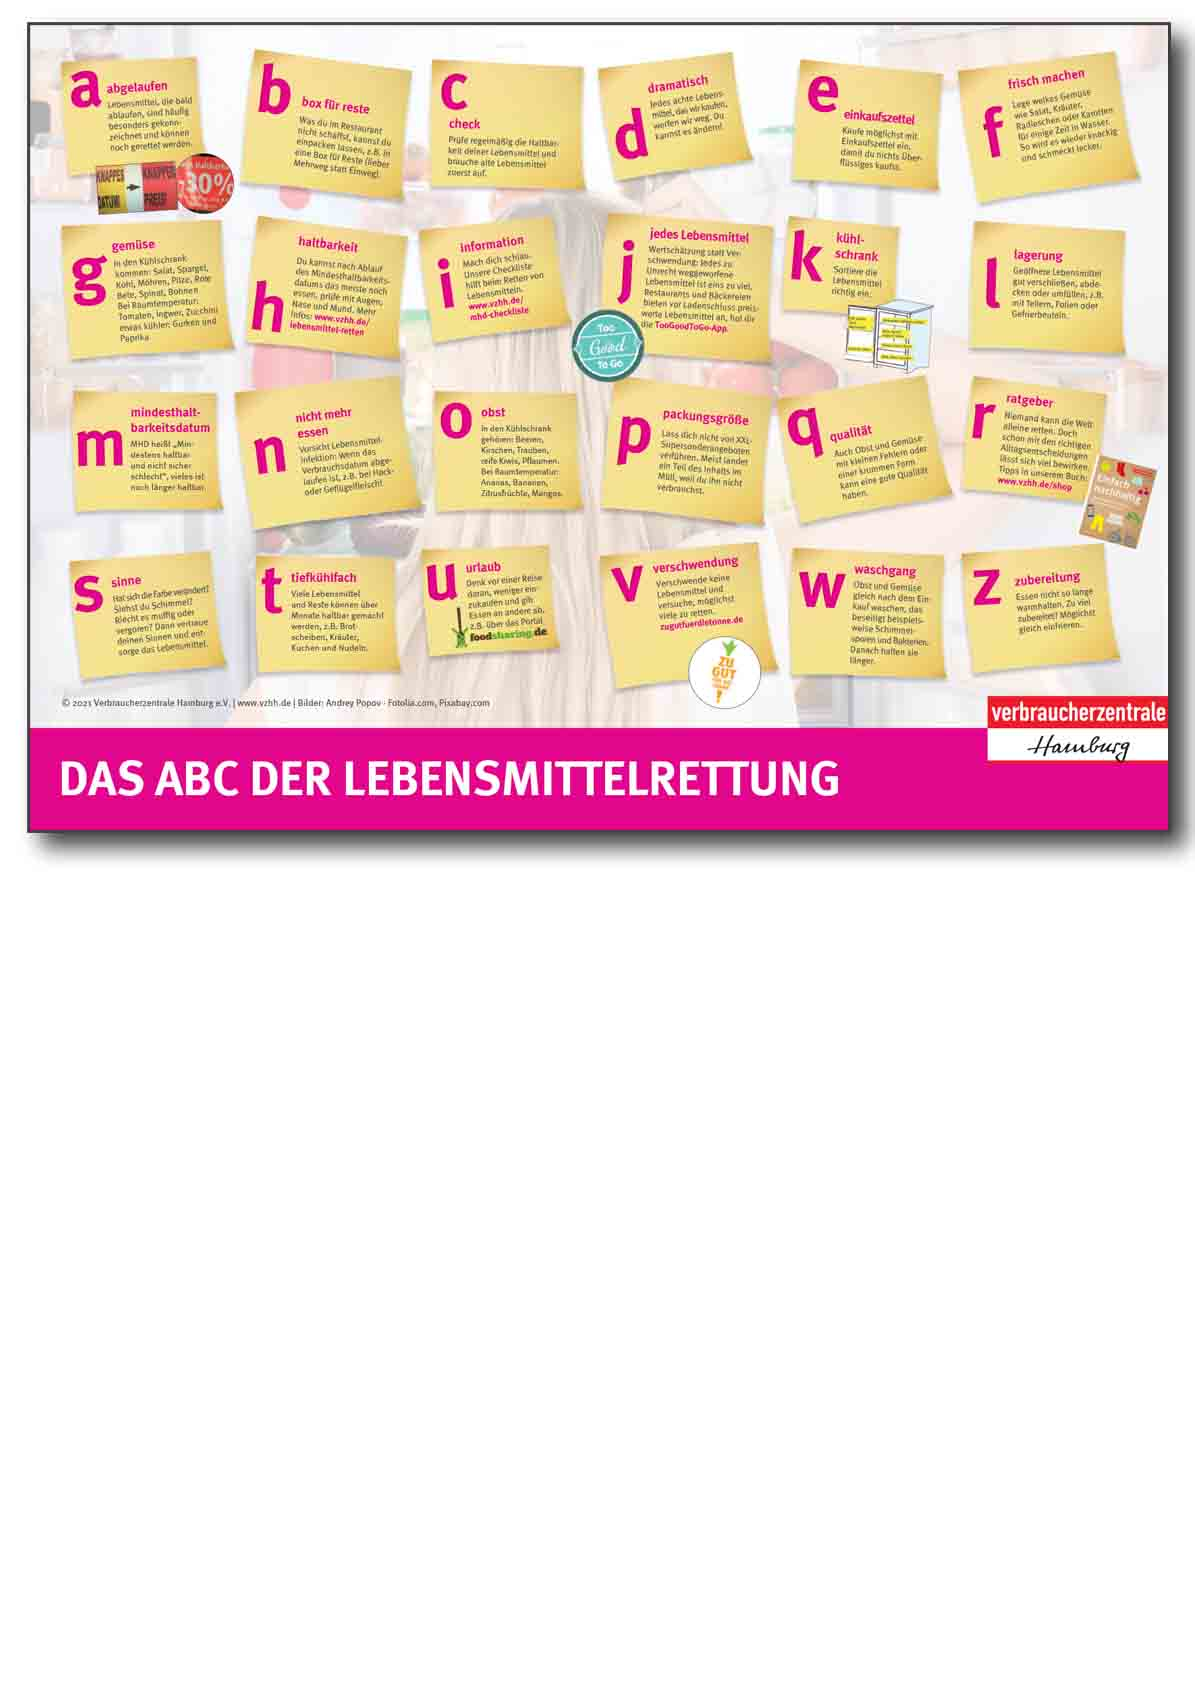 Plakat - Das ABC der Lebensmittelrettung - Verbraucherzentrale